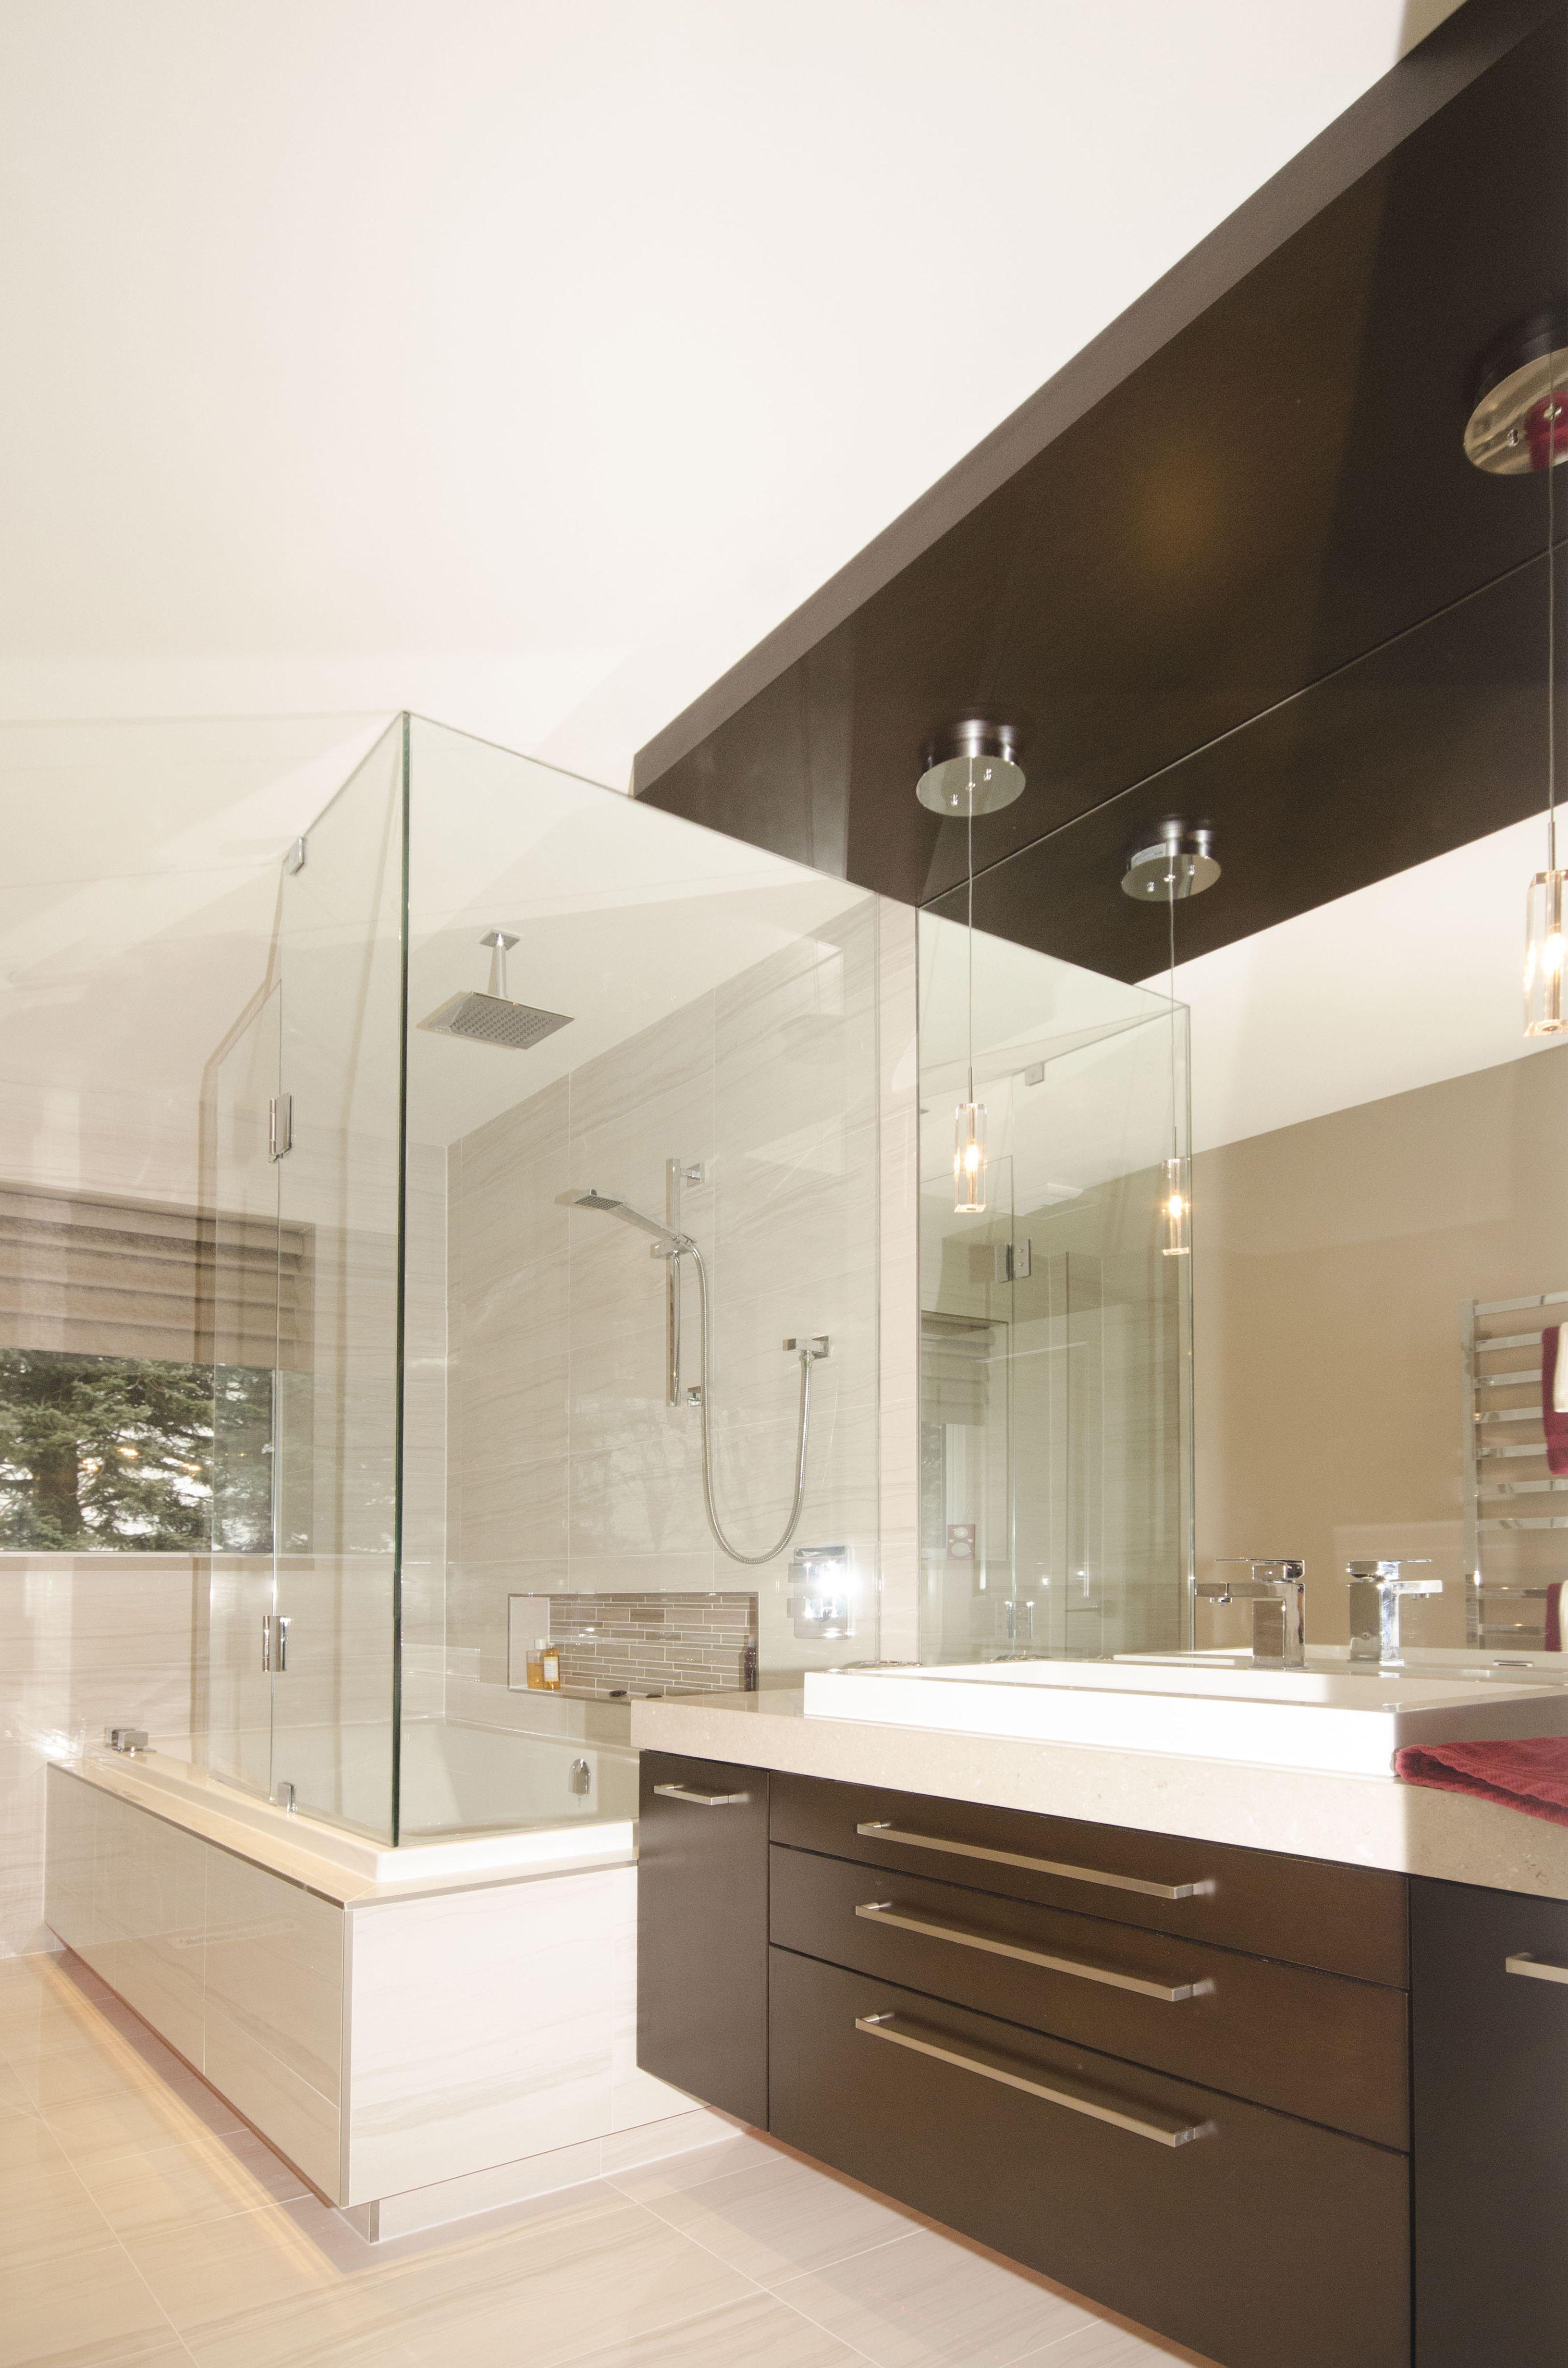 Bathroom Renovations Durham Region - Bathroom Decor